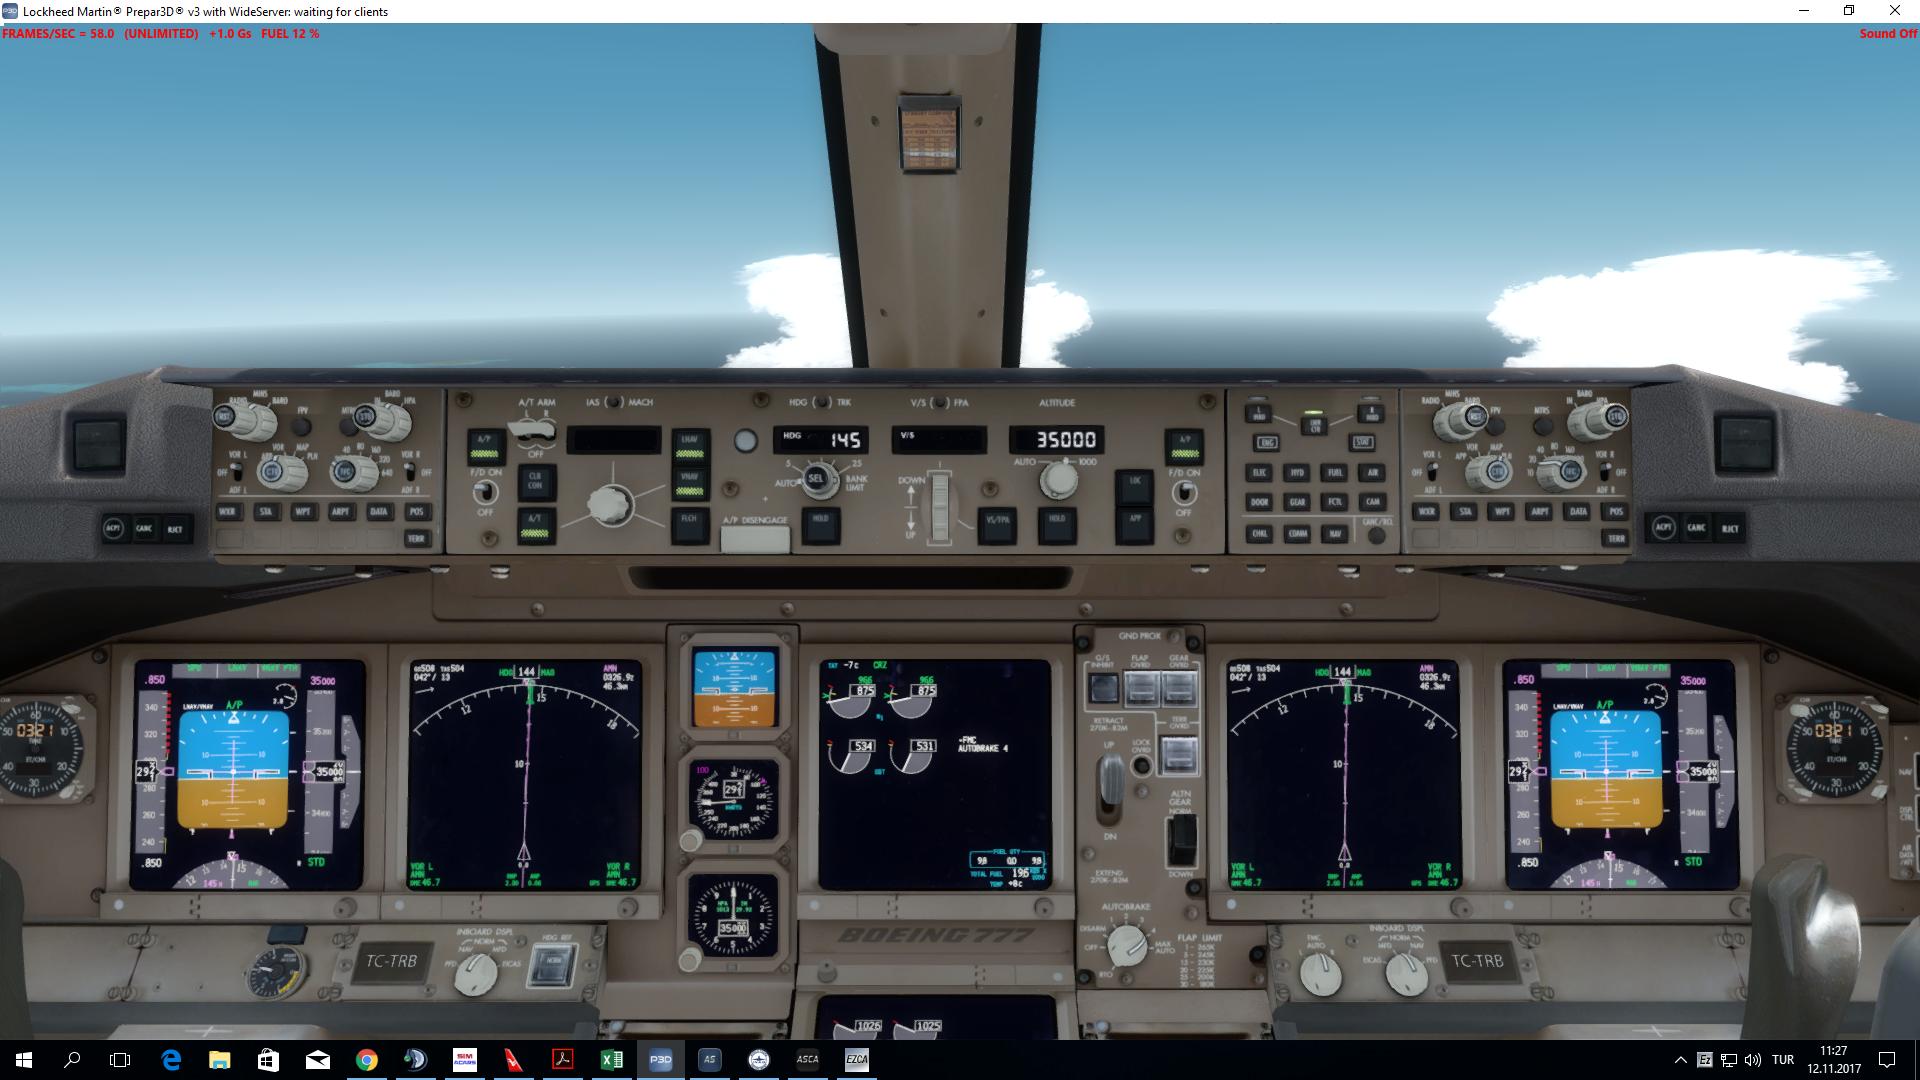 Desktop Screenshot 2017.11.12 - 11.27.10.39